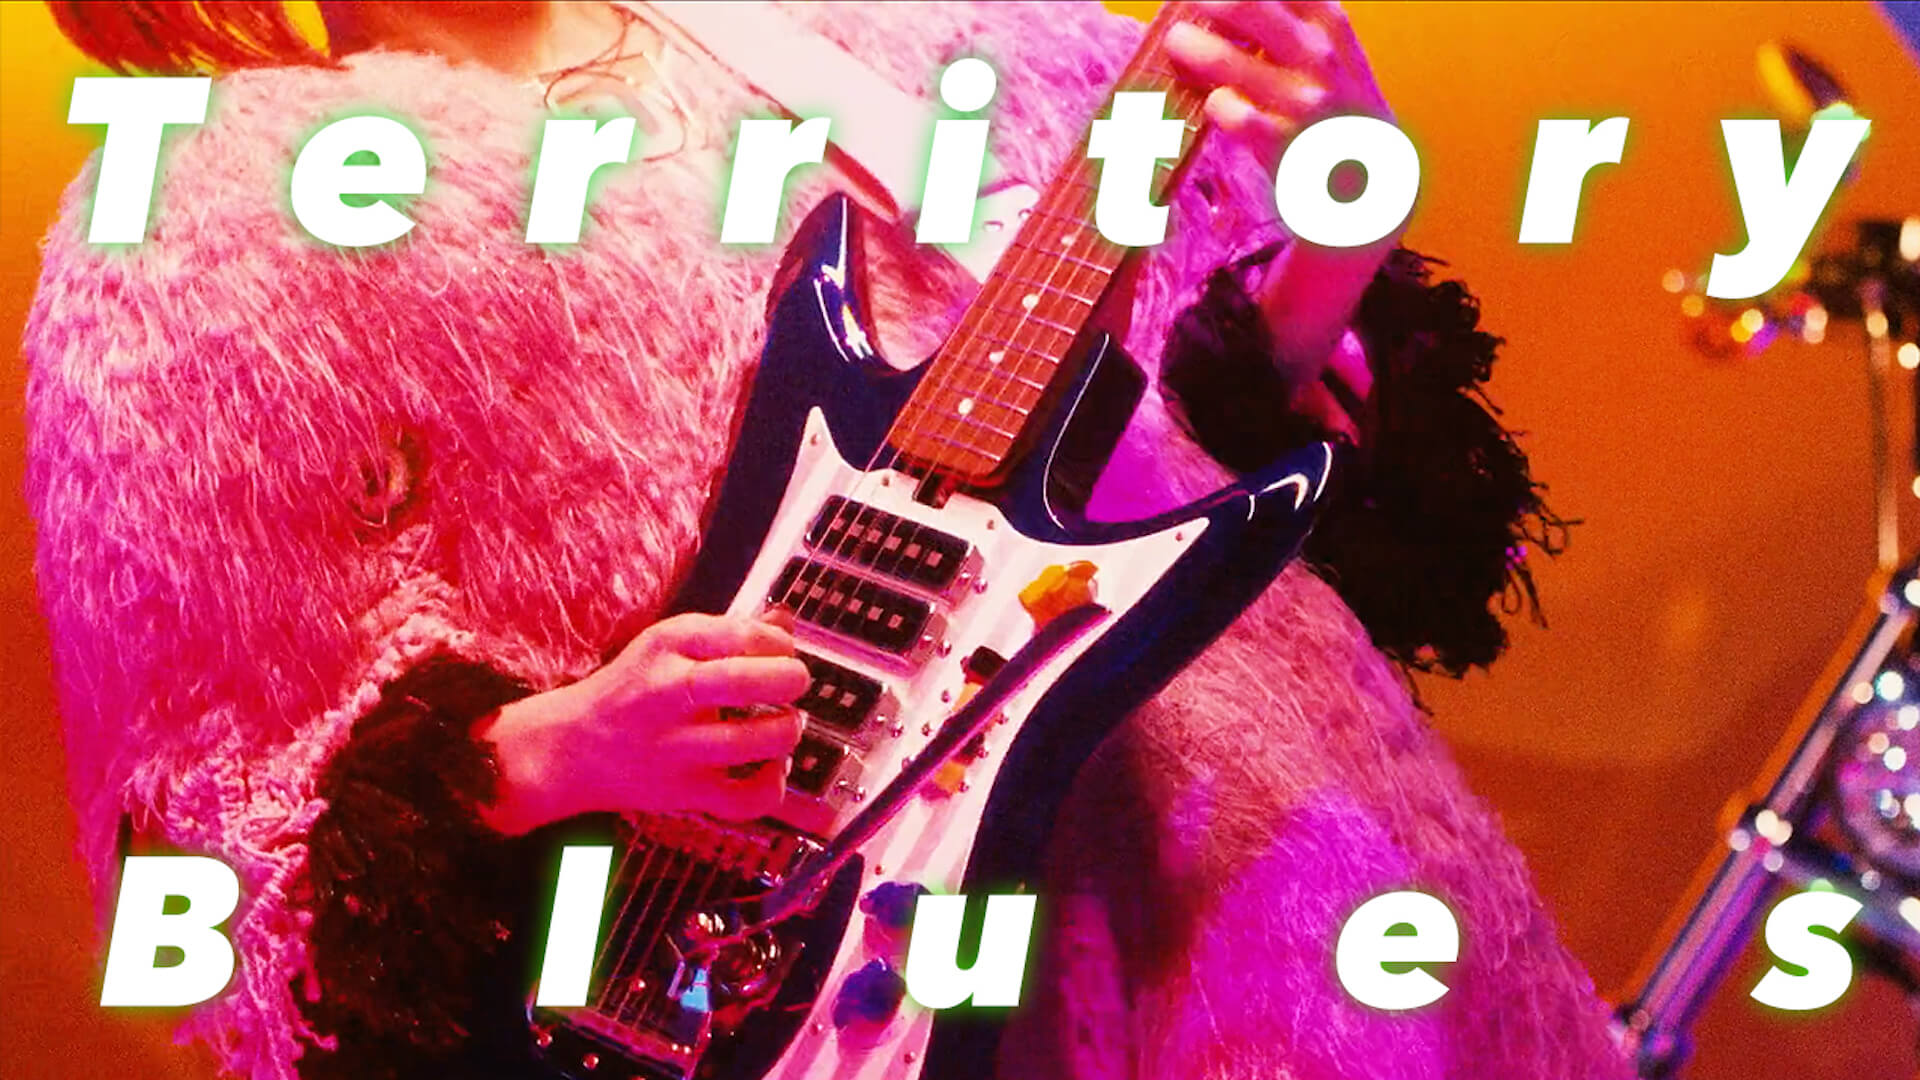 Reiの最新シングル「Territory Blues」配信開始&MVも完成!ハーレーダビッドソン × Rei によるコラボ・プロジェクト<SEEK for SOUL>オリジナル楽曲 music190919-rei-harley-davidson-2